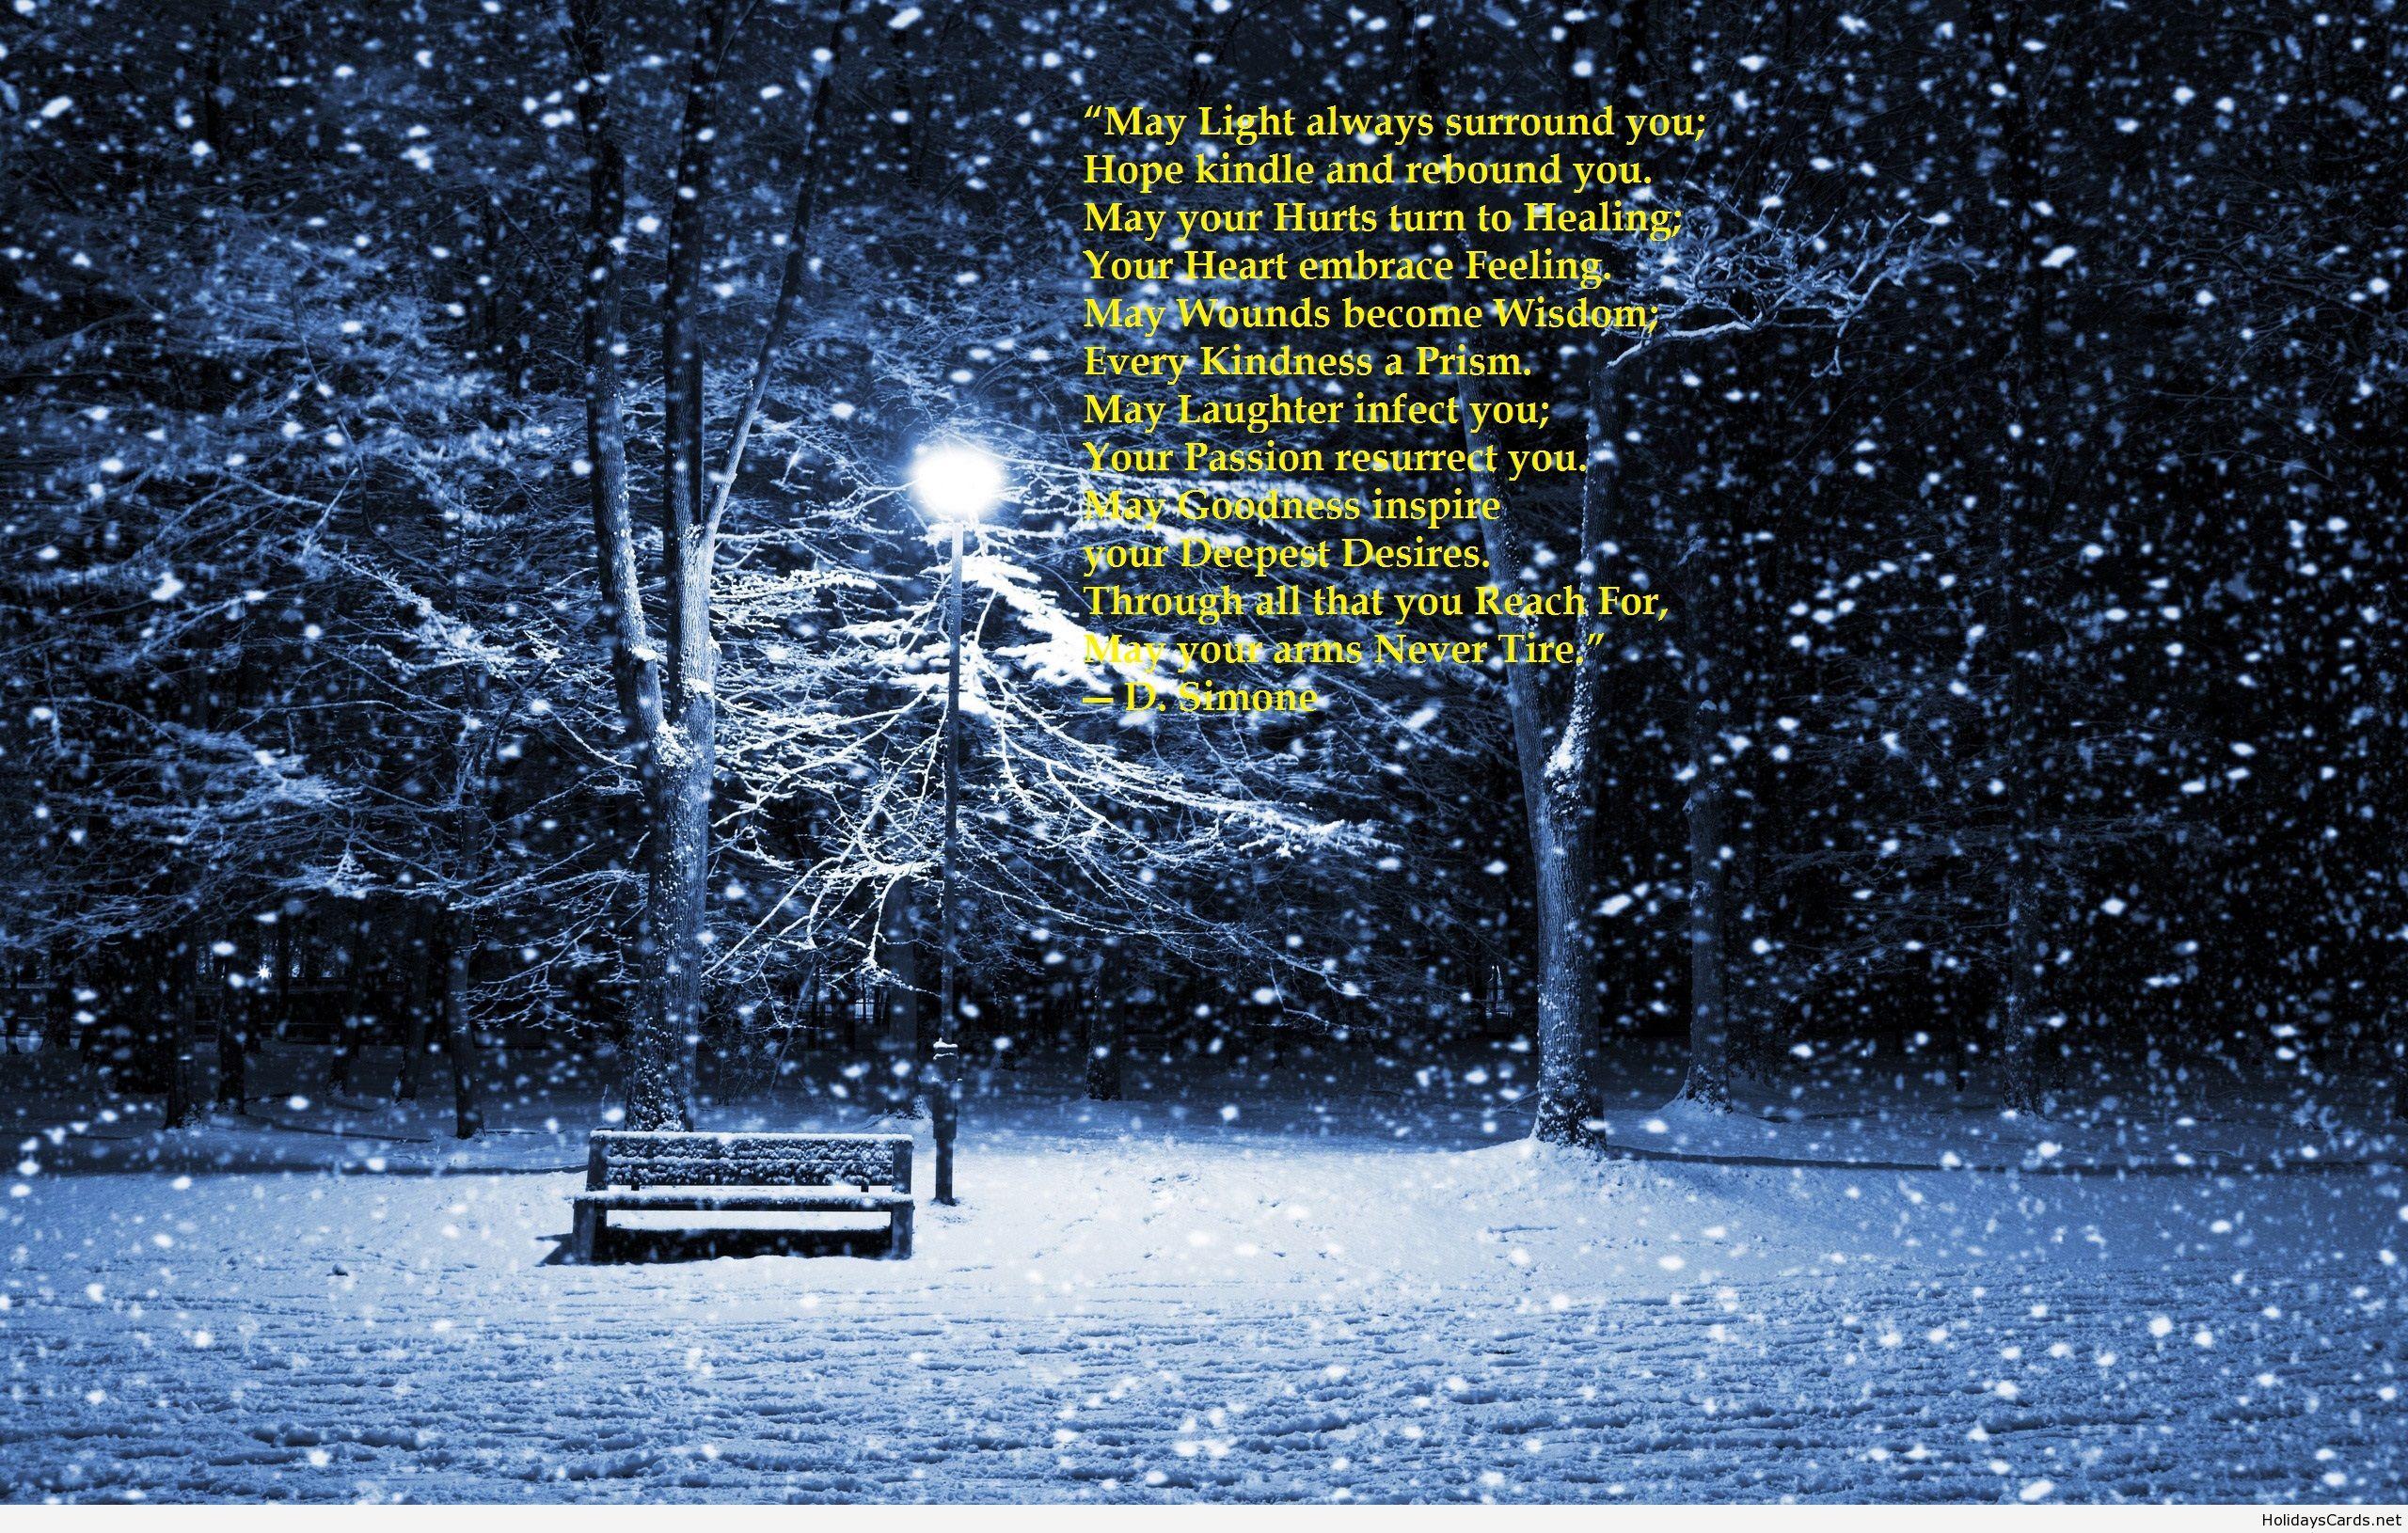 Winter Desktop Wallpaper With New Year Poem